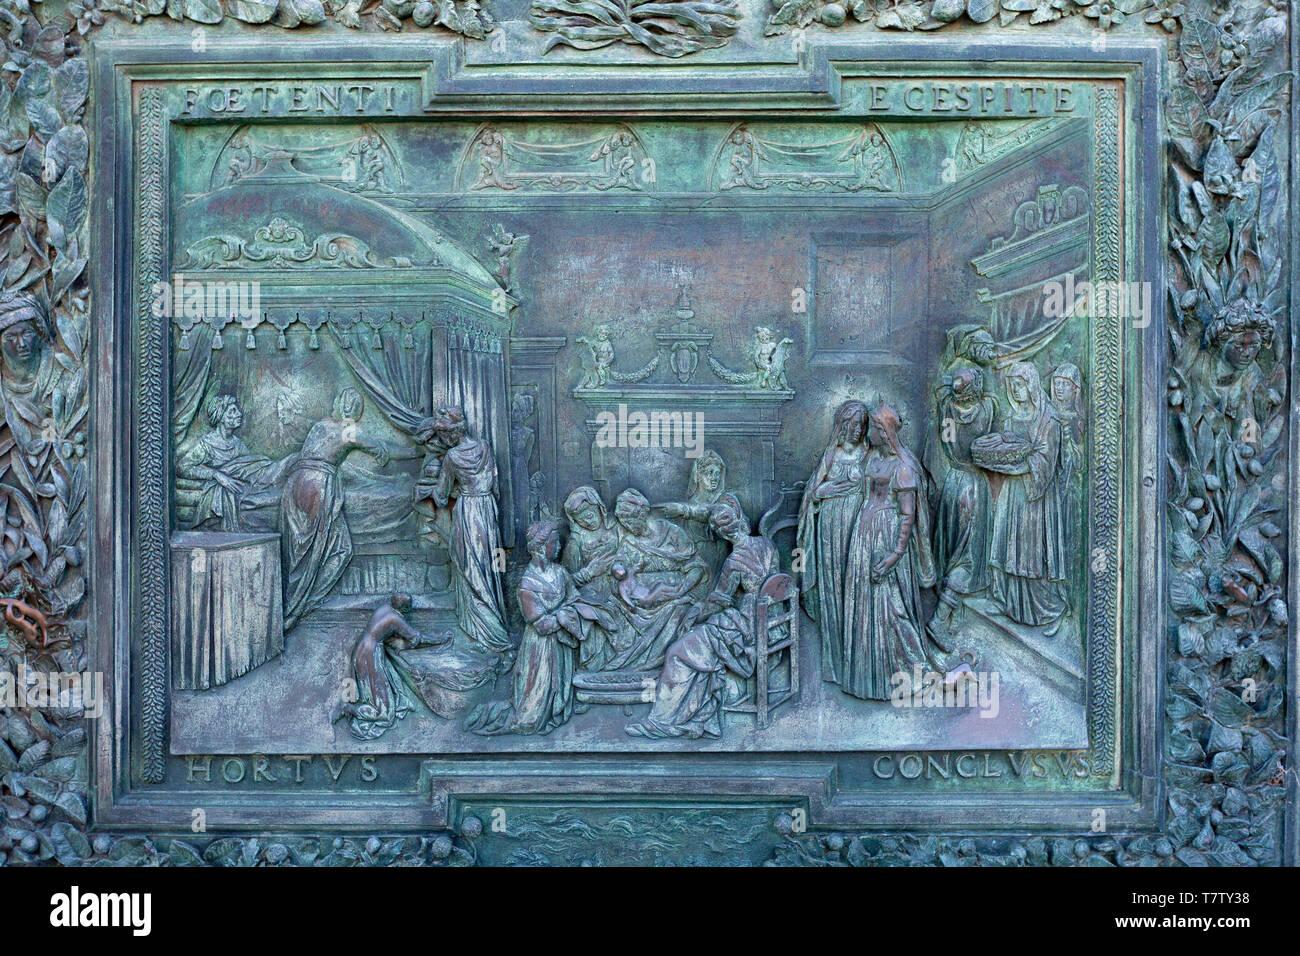 Detail of bronze doors of Pisa Cathedral Stock Photo